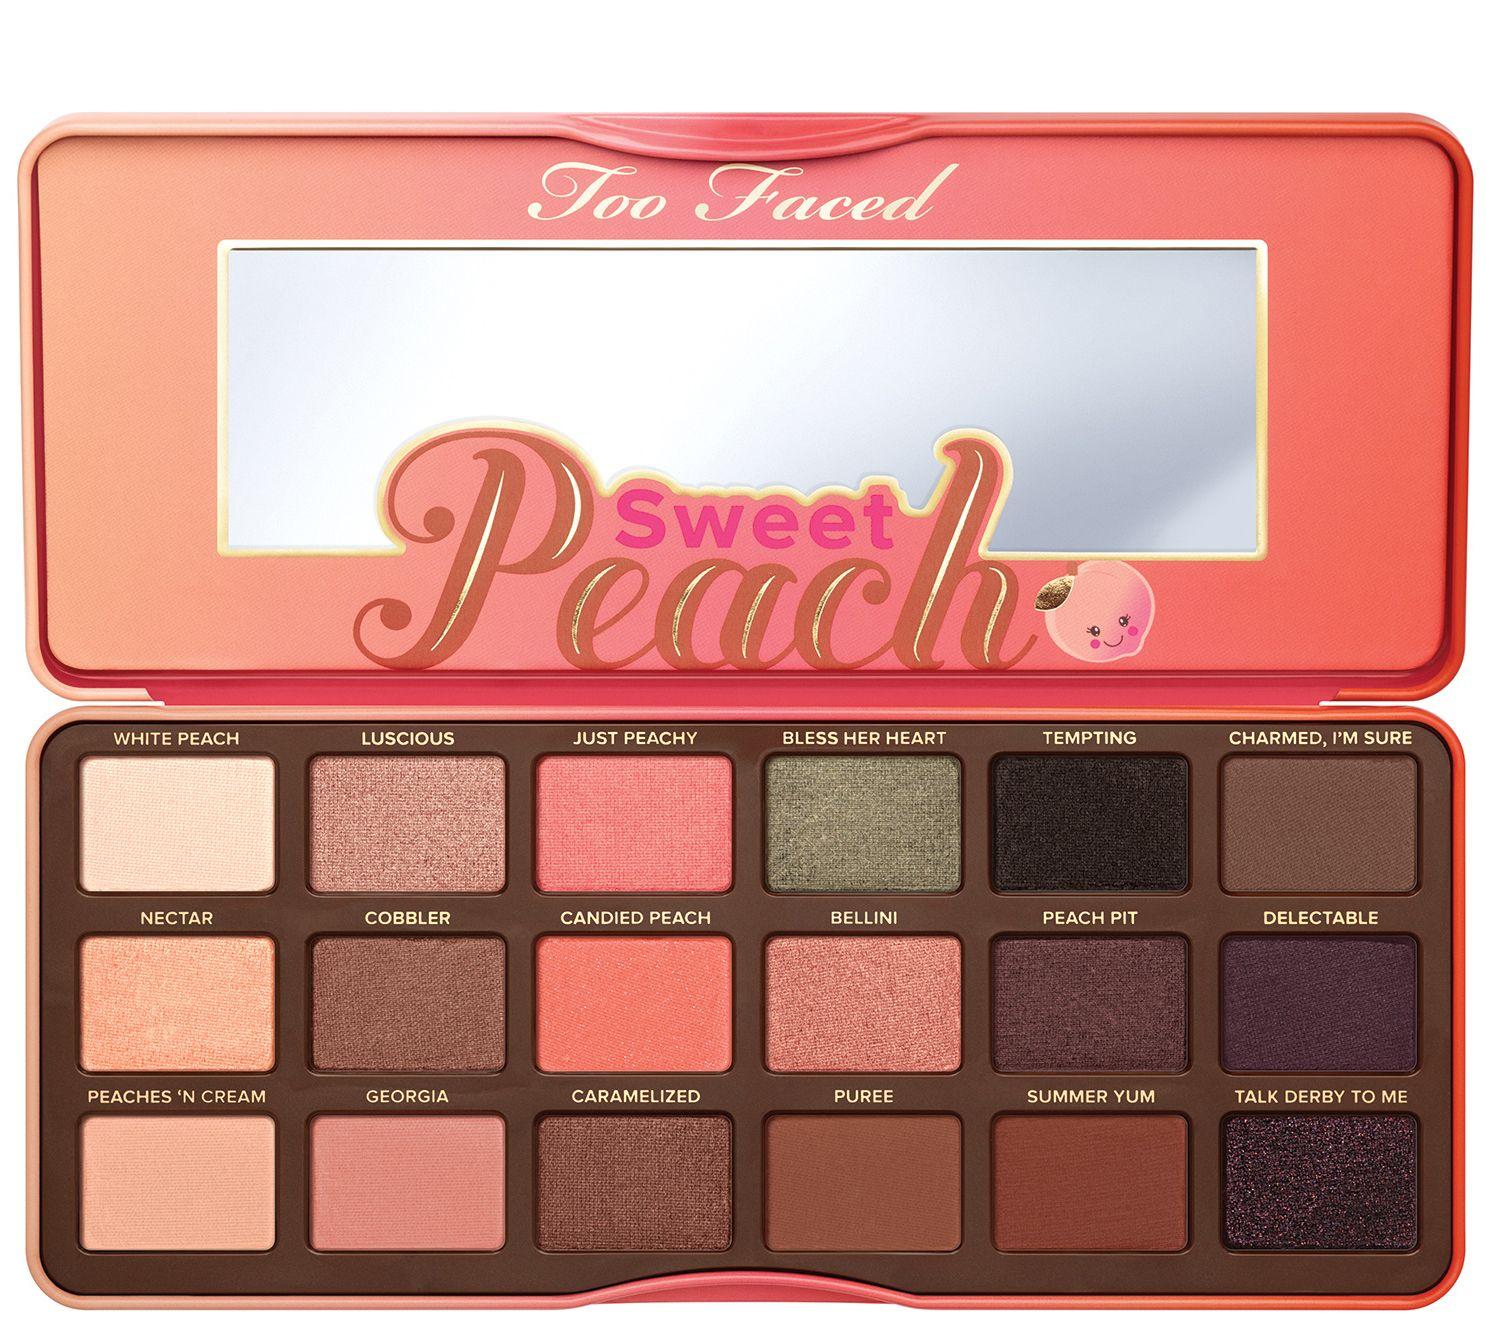 QVC Too Faced Sweet Peach Eyeshadow palette 24.99 free shipping